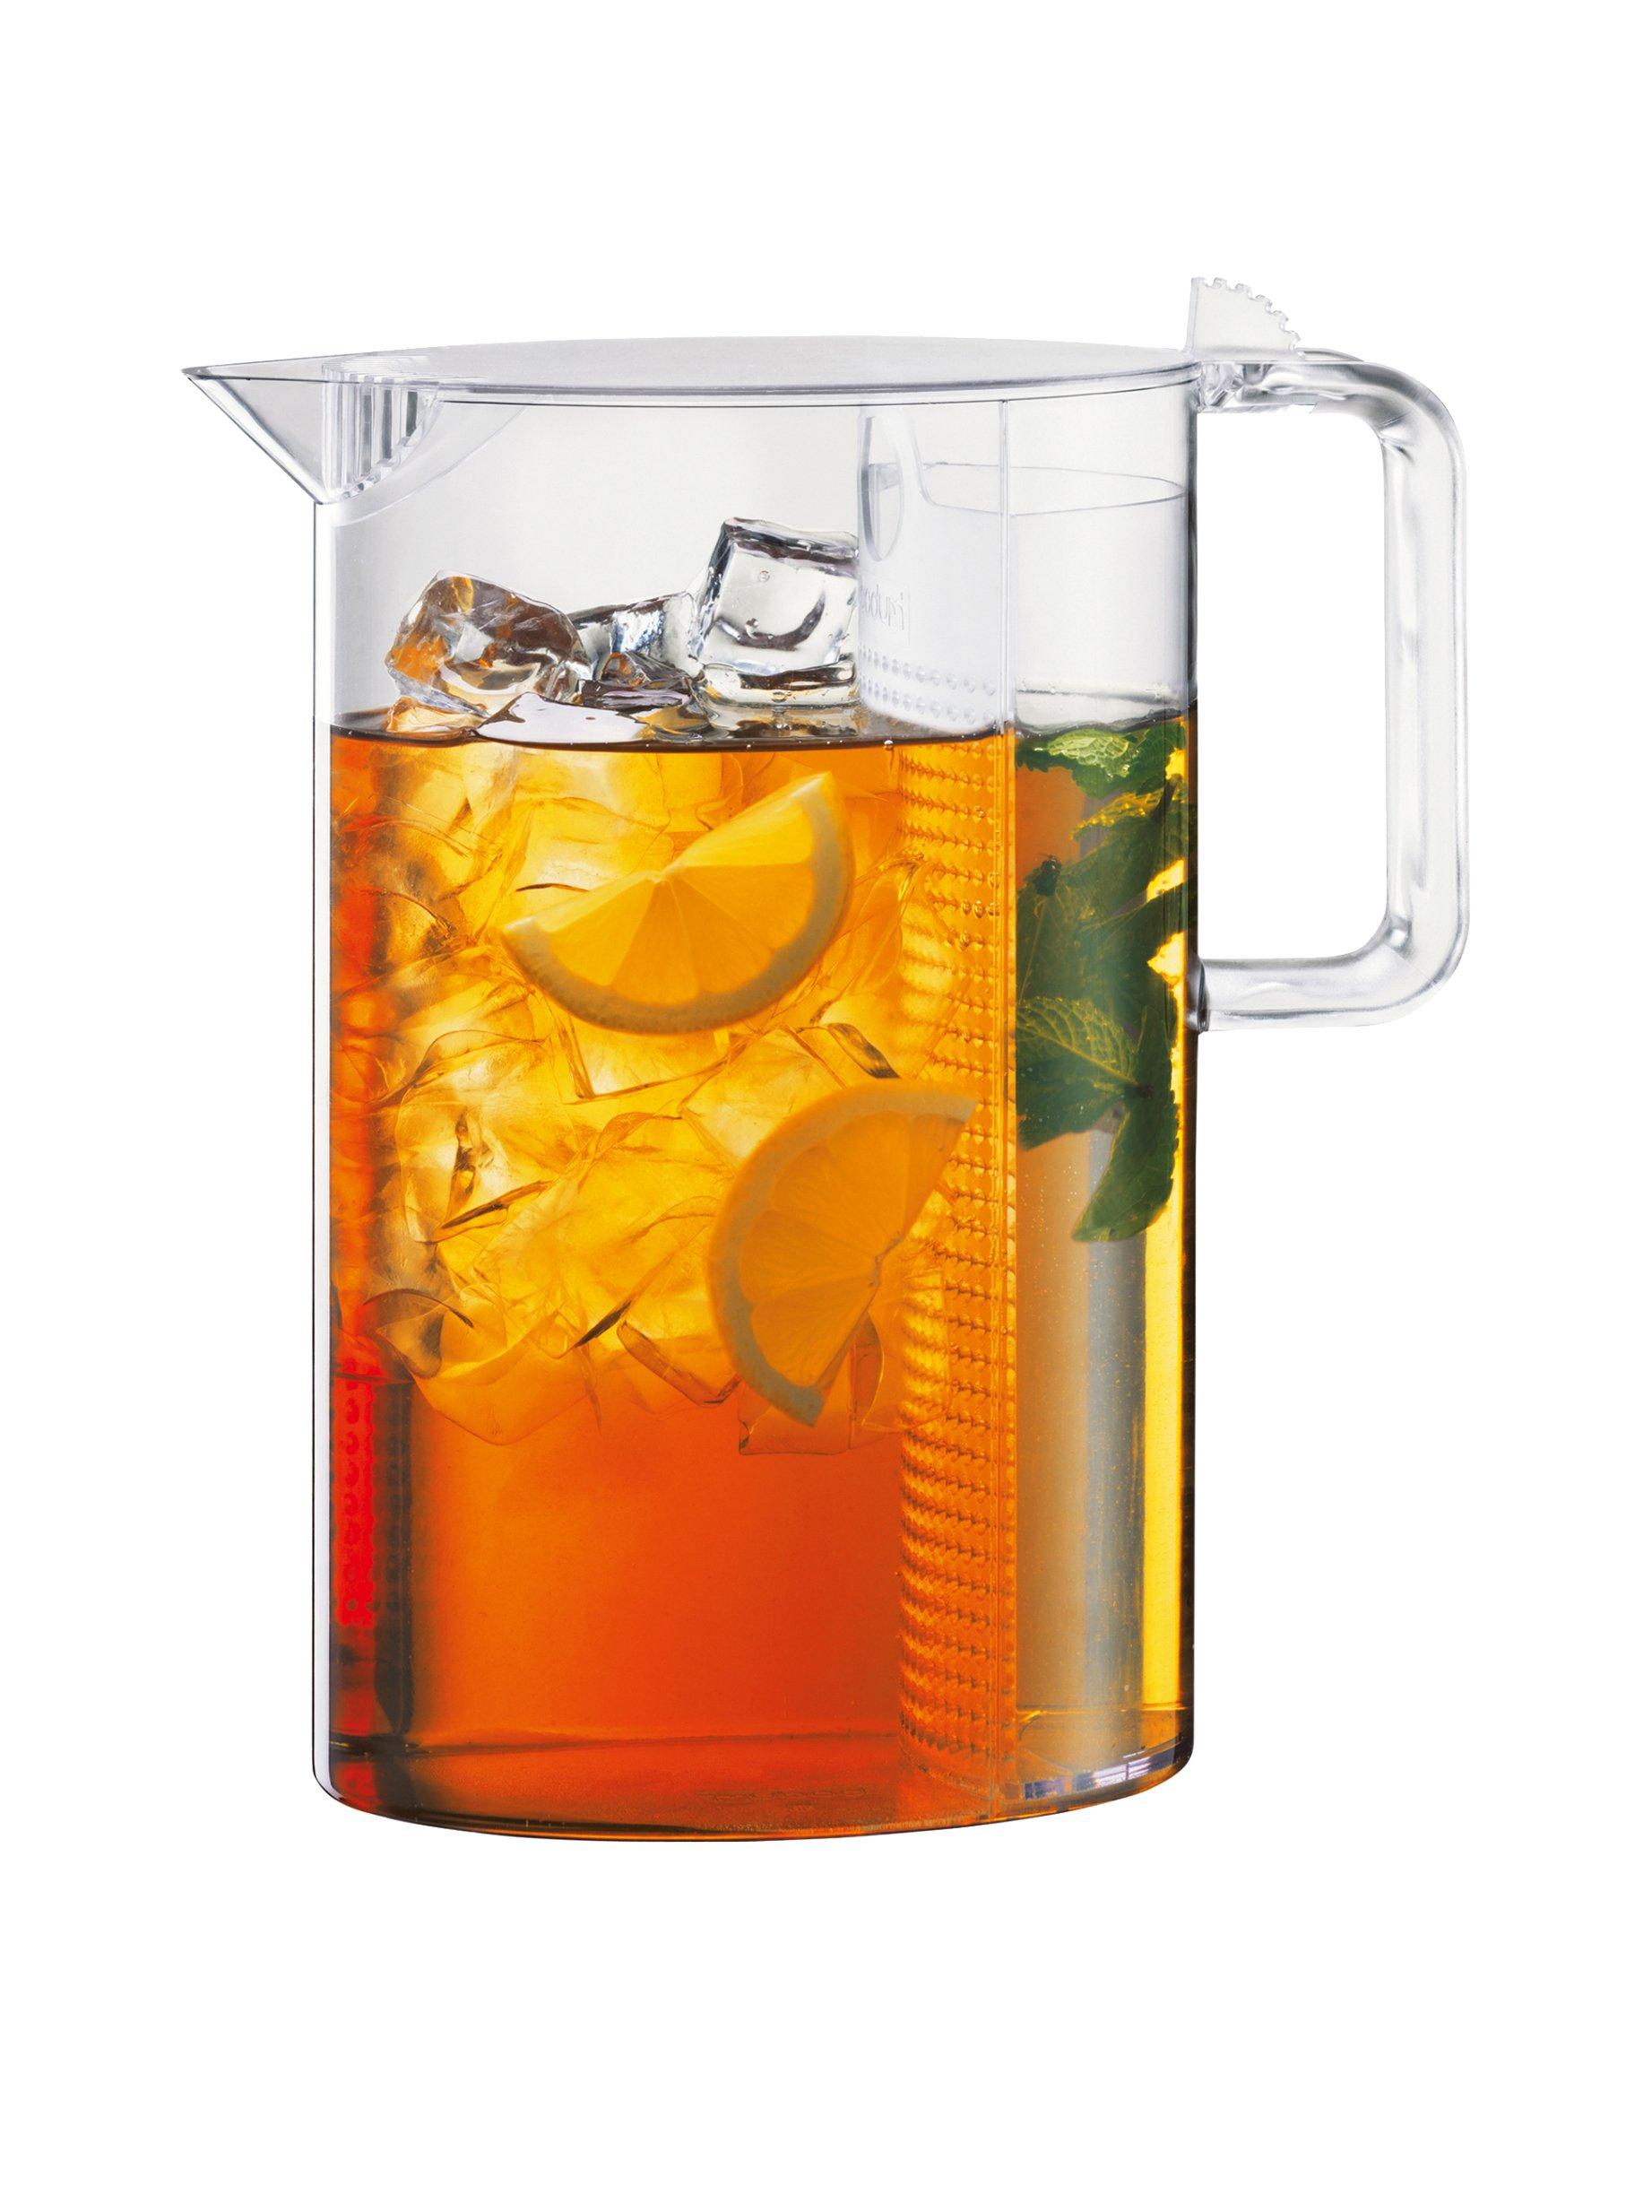 Bodum Ceylon Ice Tea Jug with Filter, 101 oz., Clear by Bodum (Image #1)